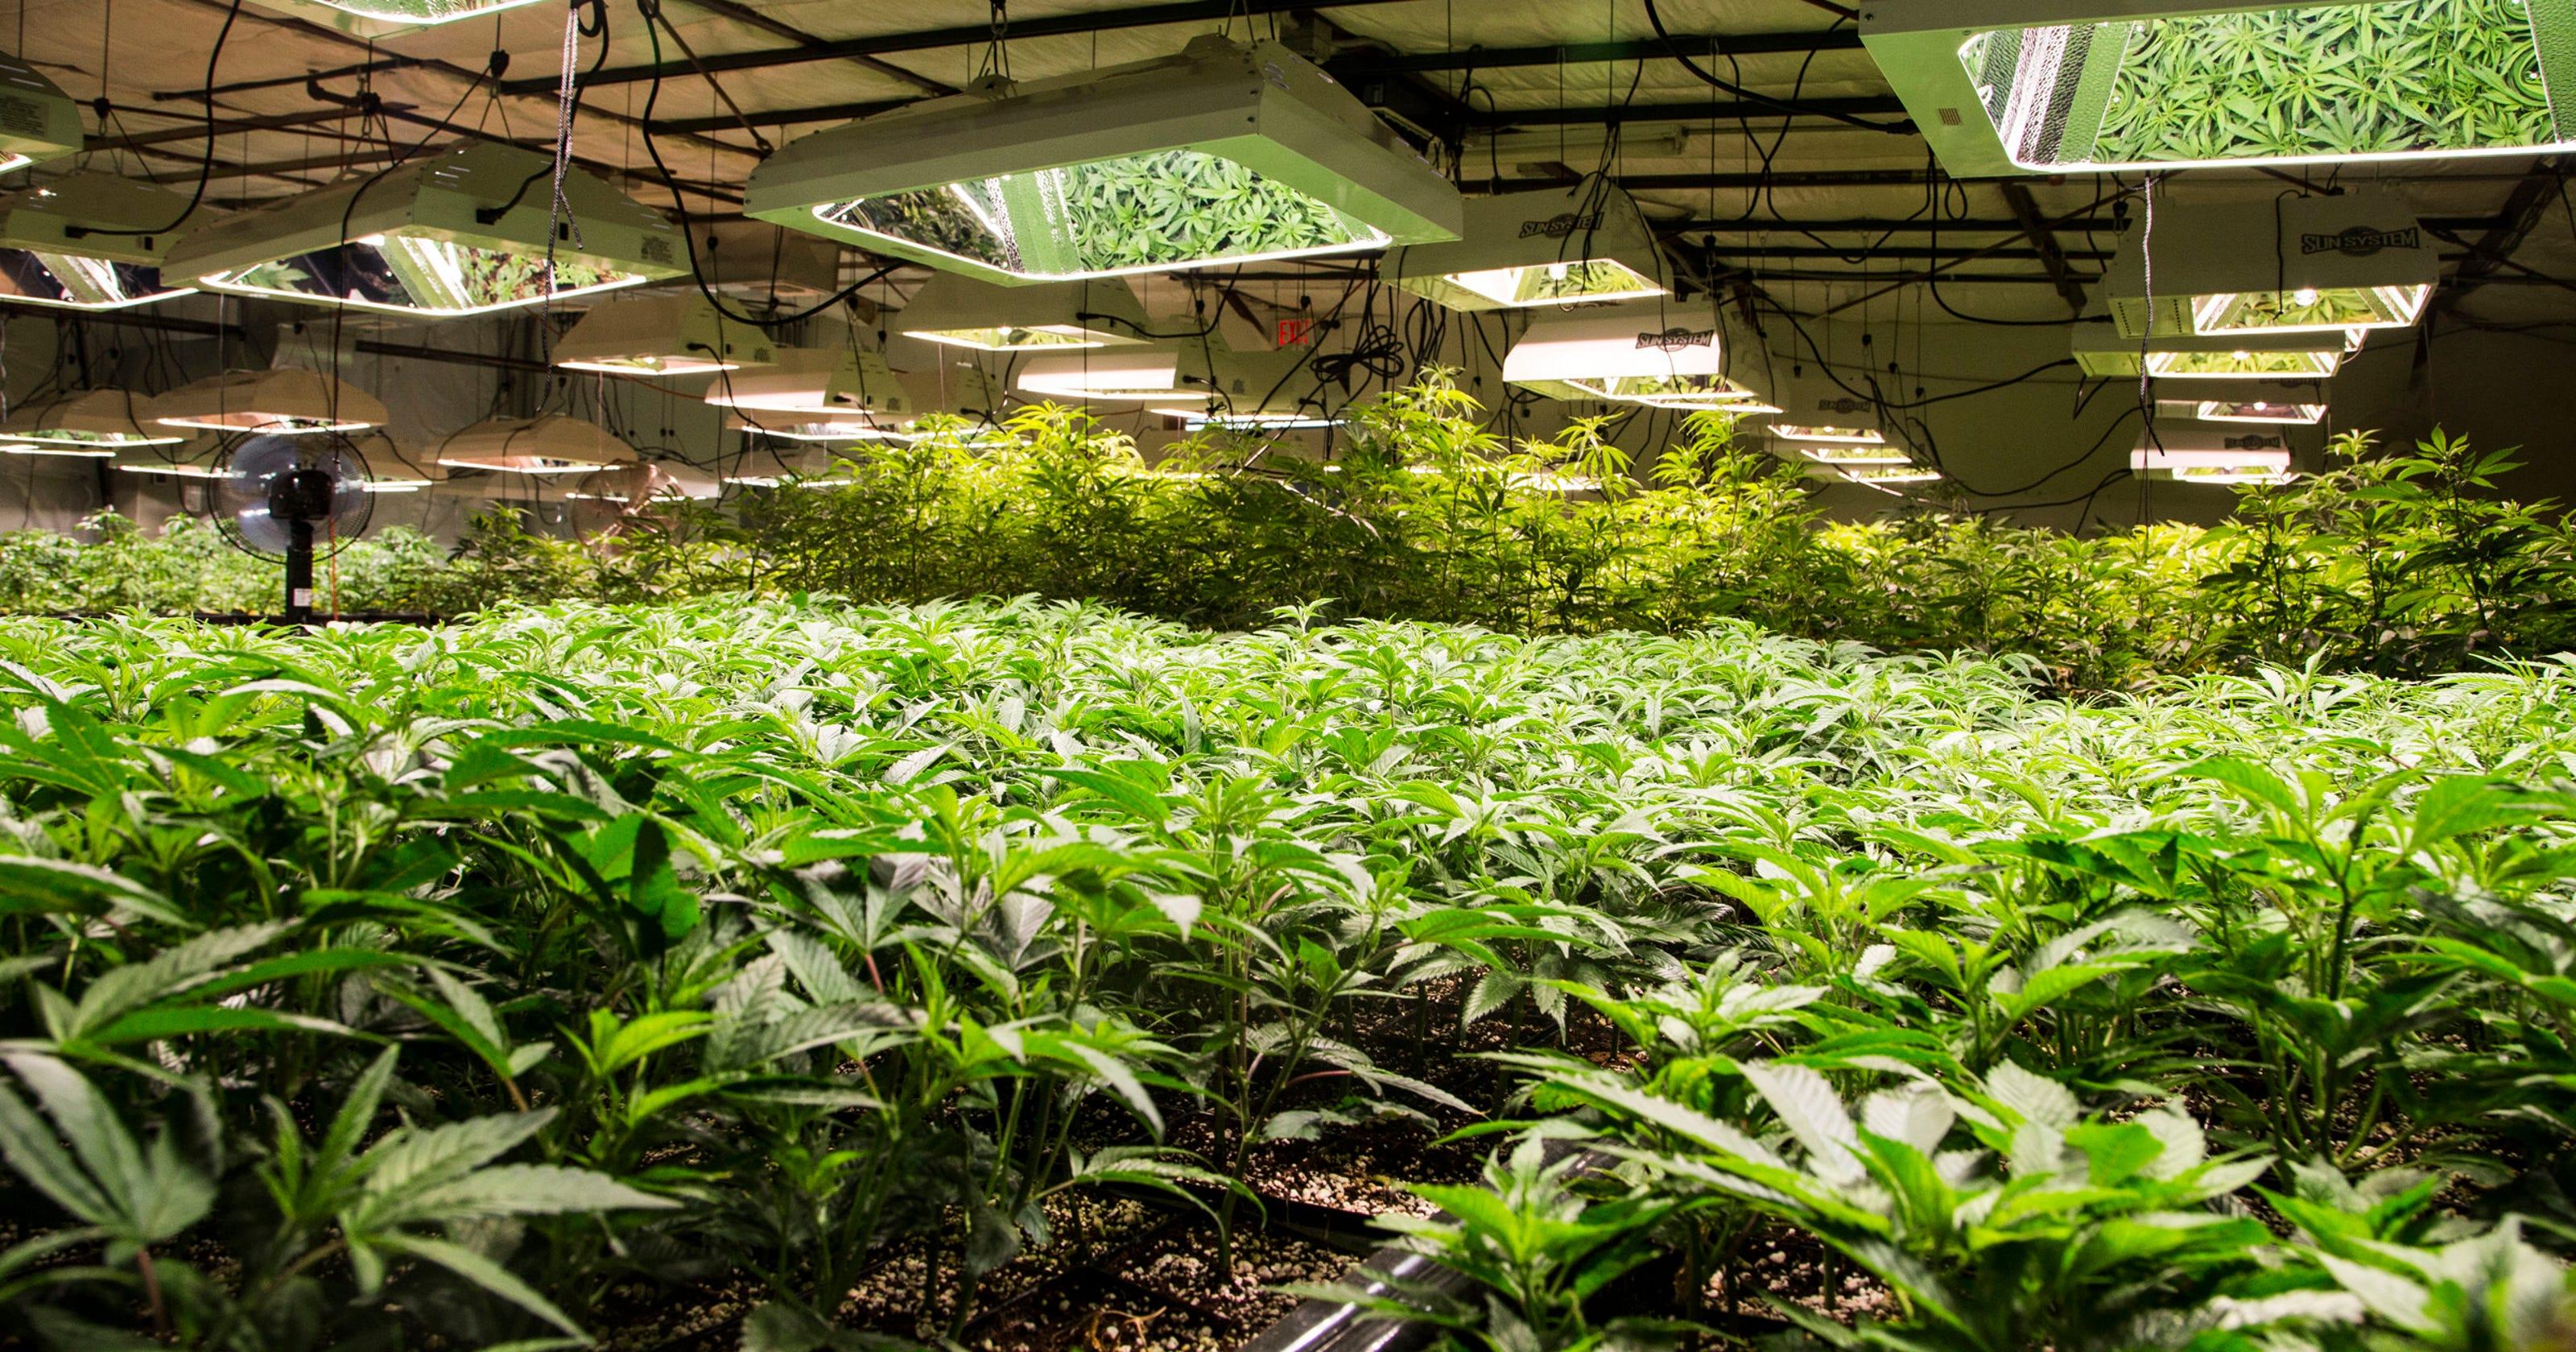 AZ Supreme Court allows medical marijuana on probation